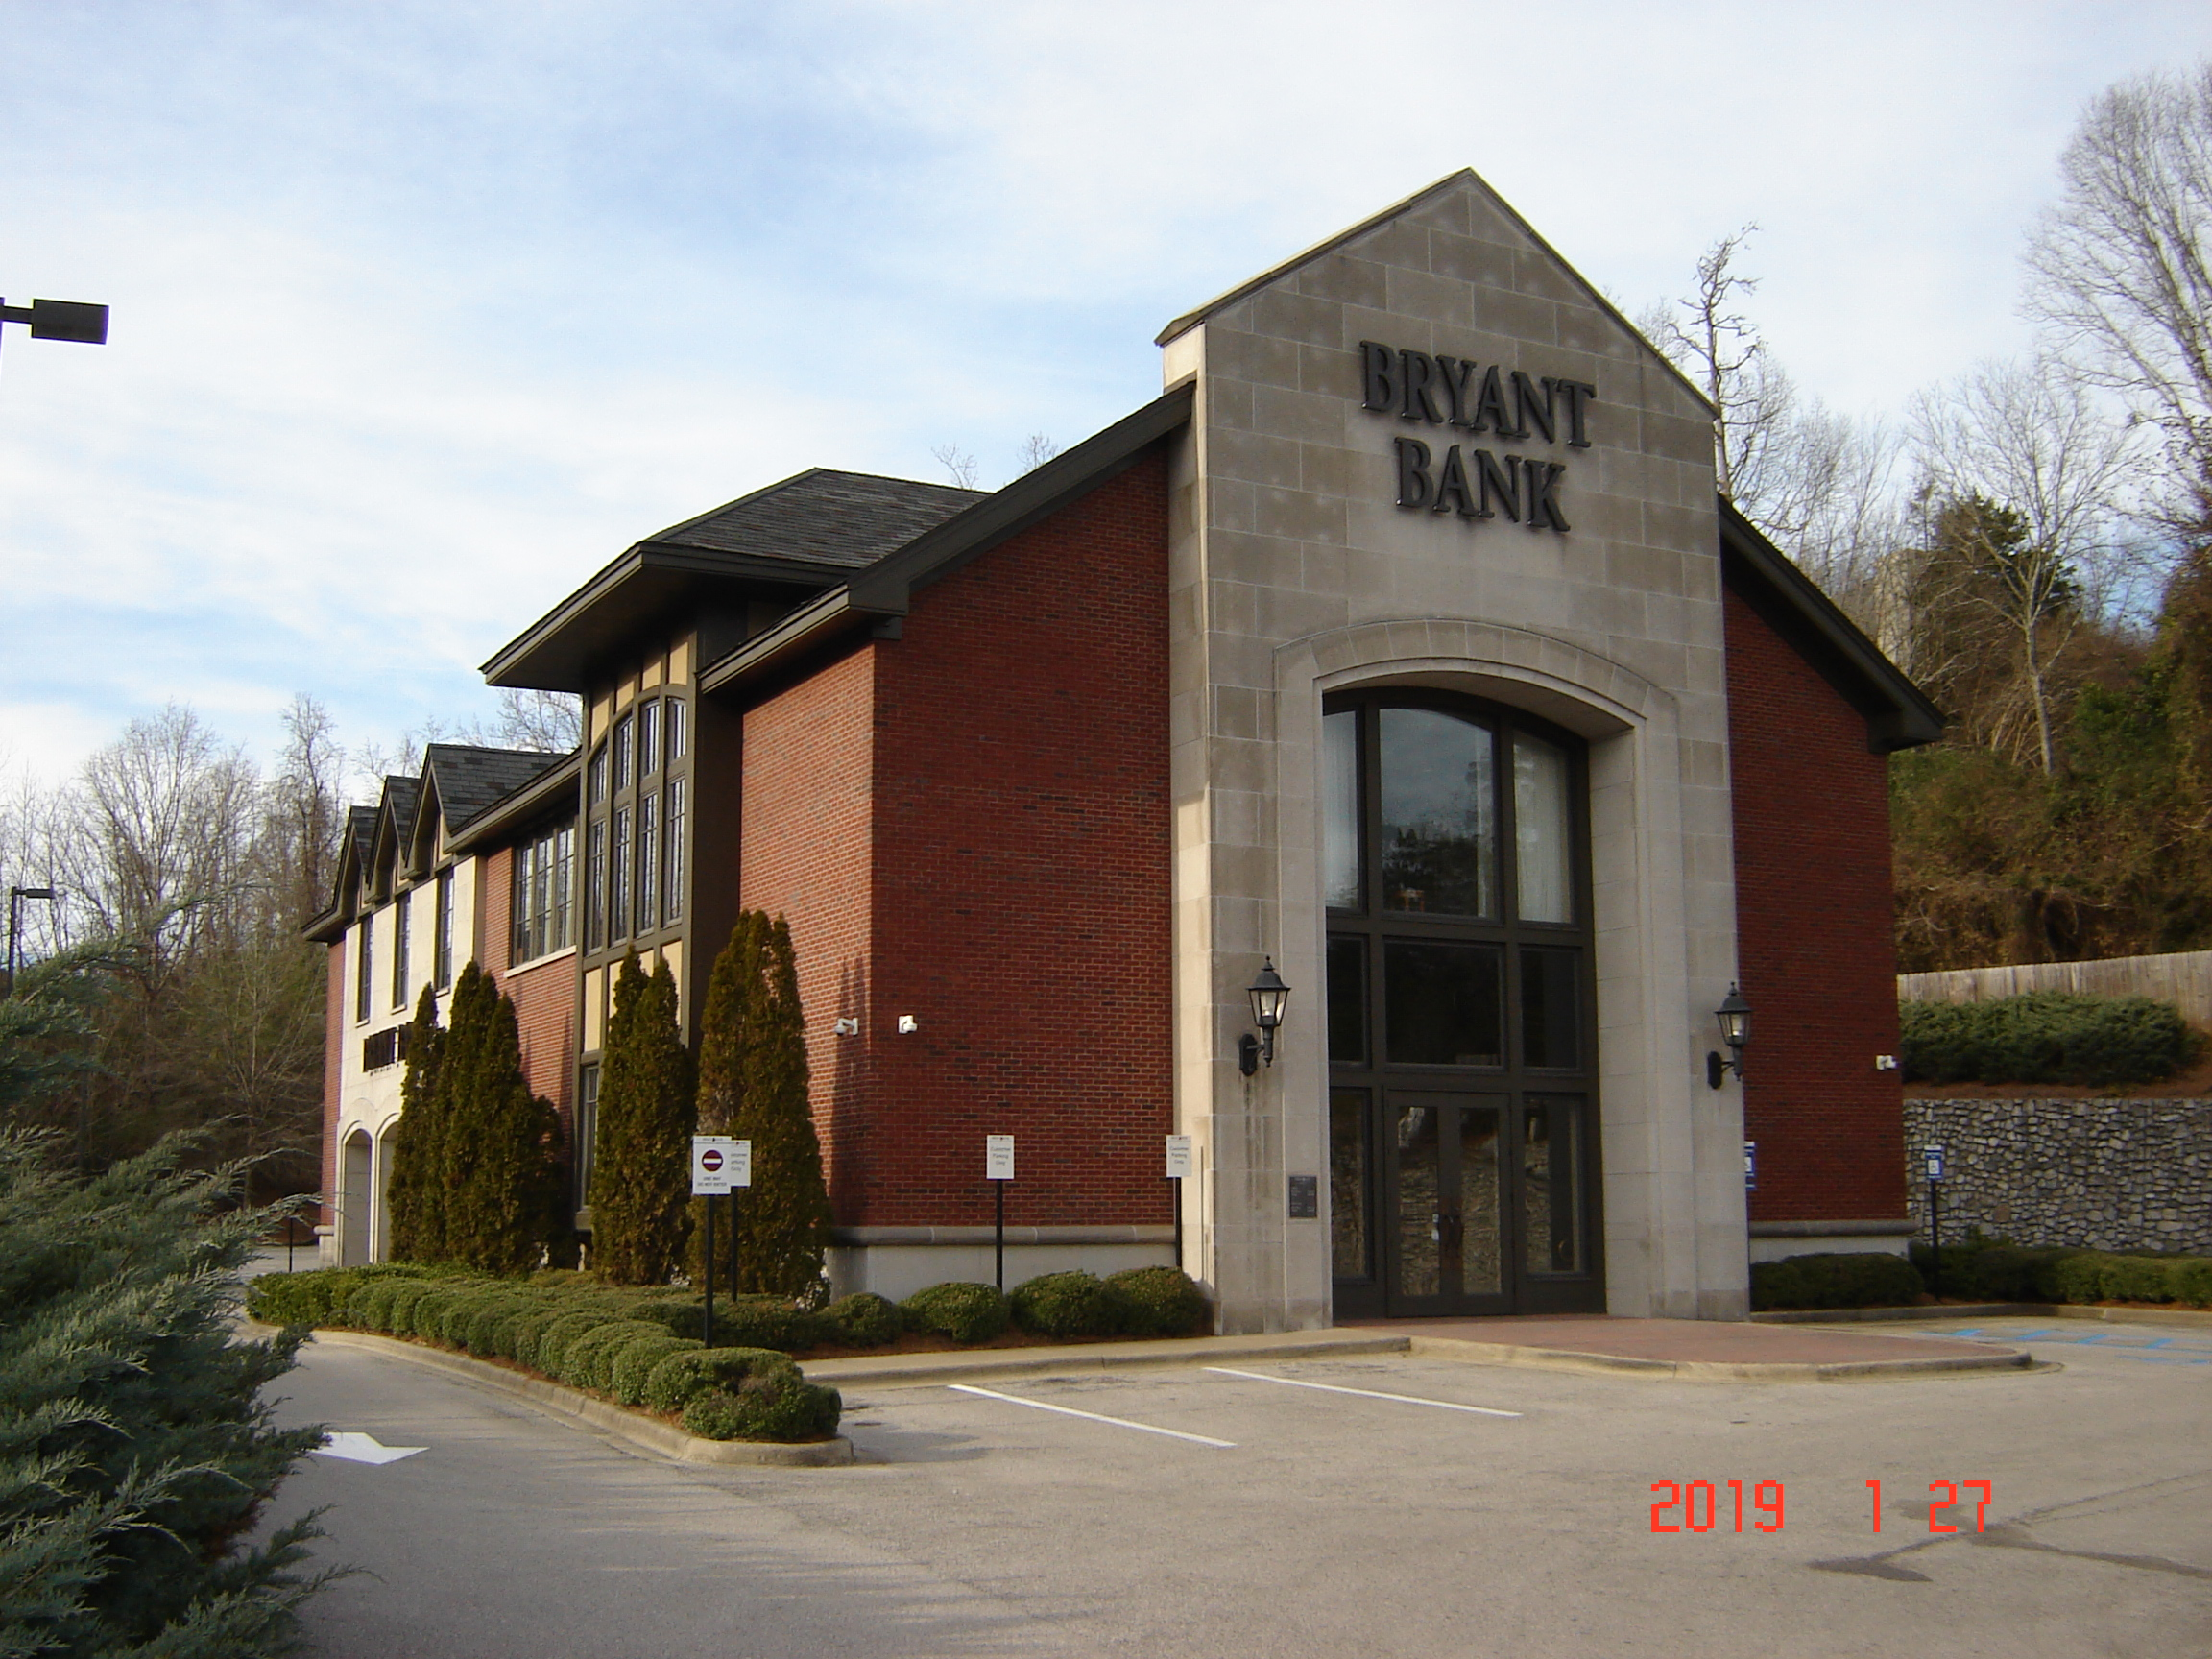 Bryant Bank - Birmingham, Alabama